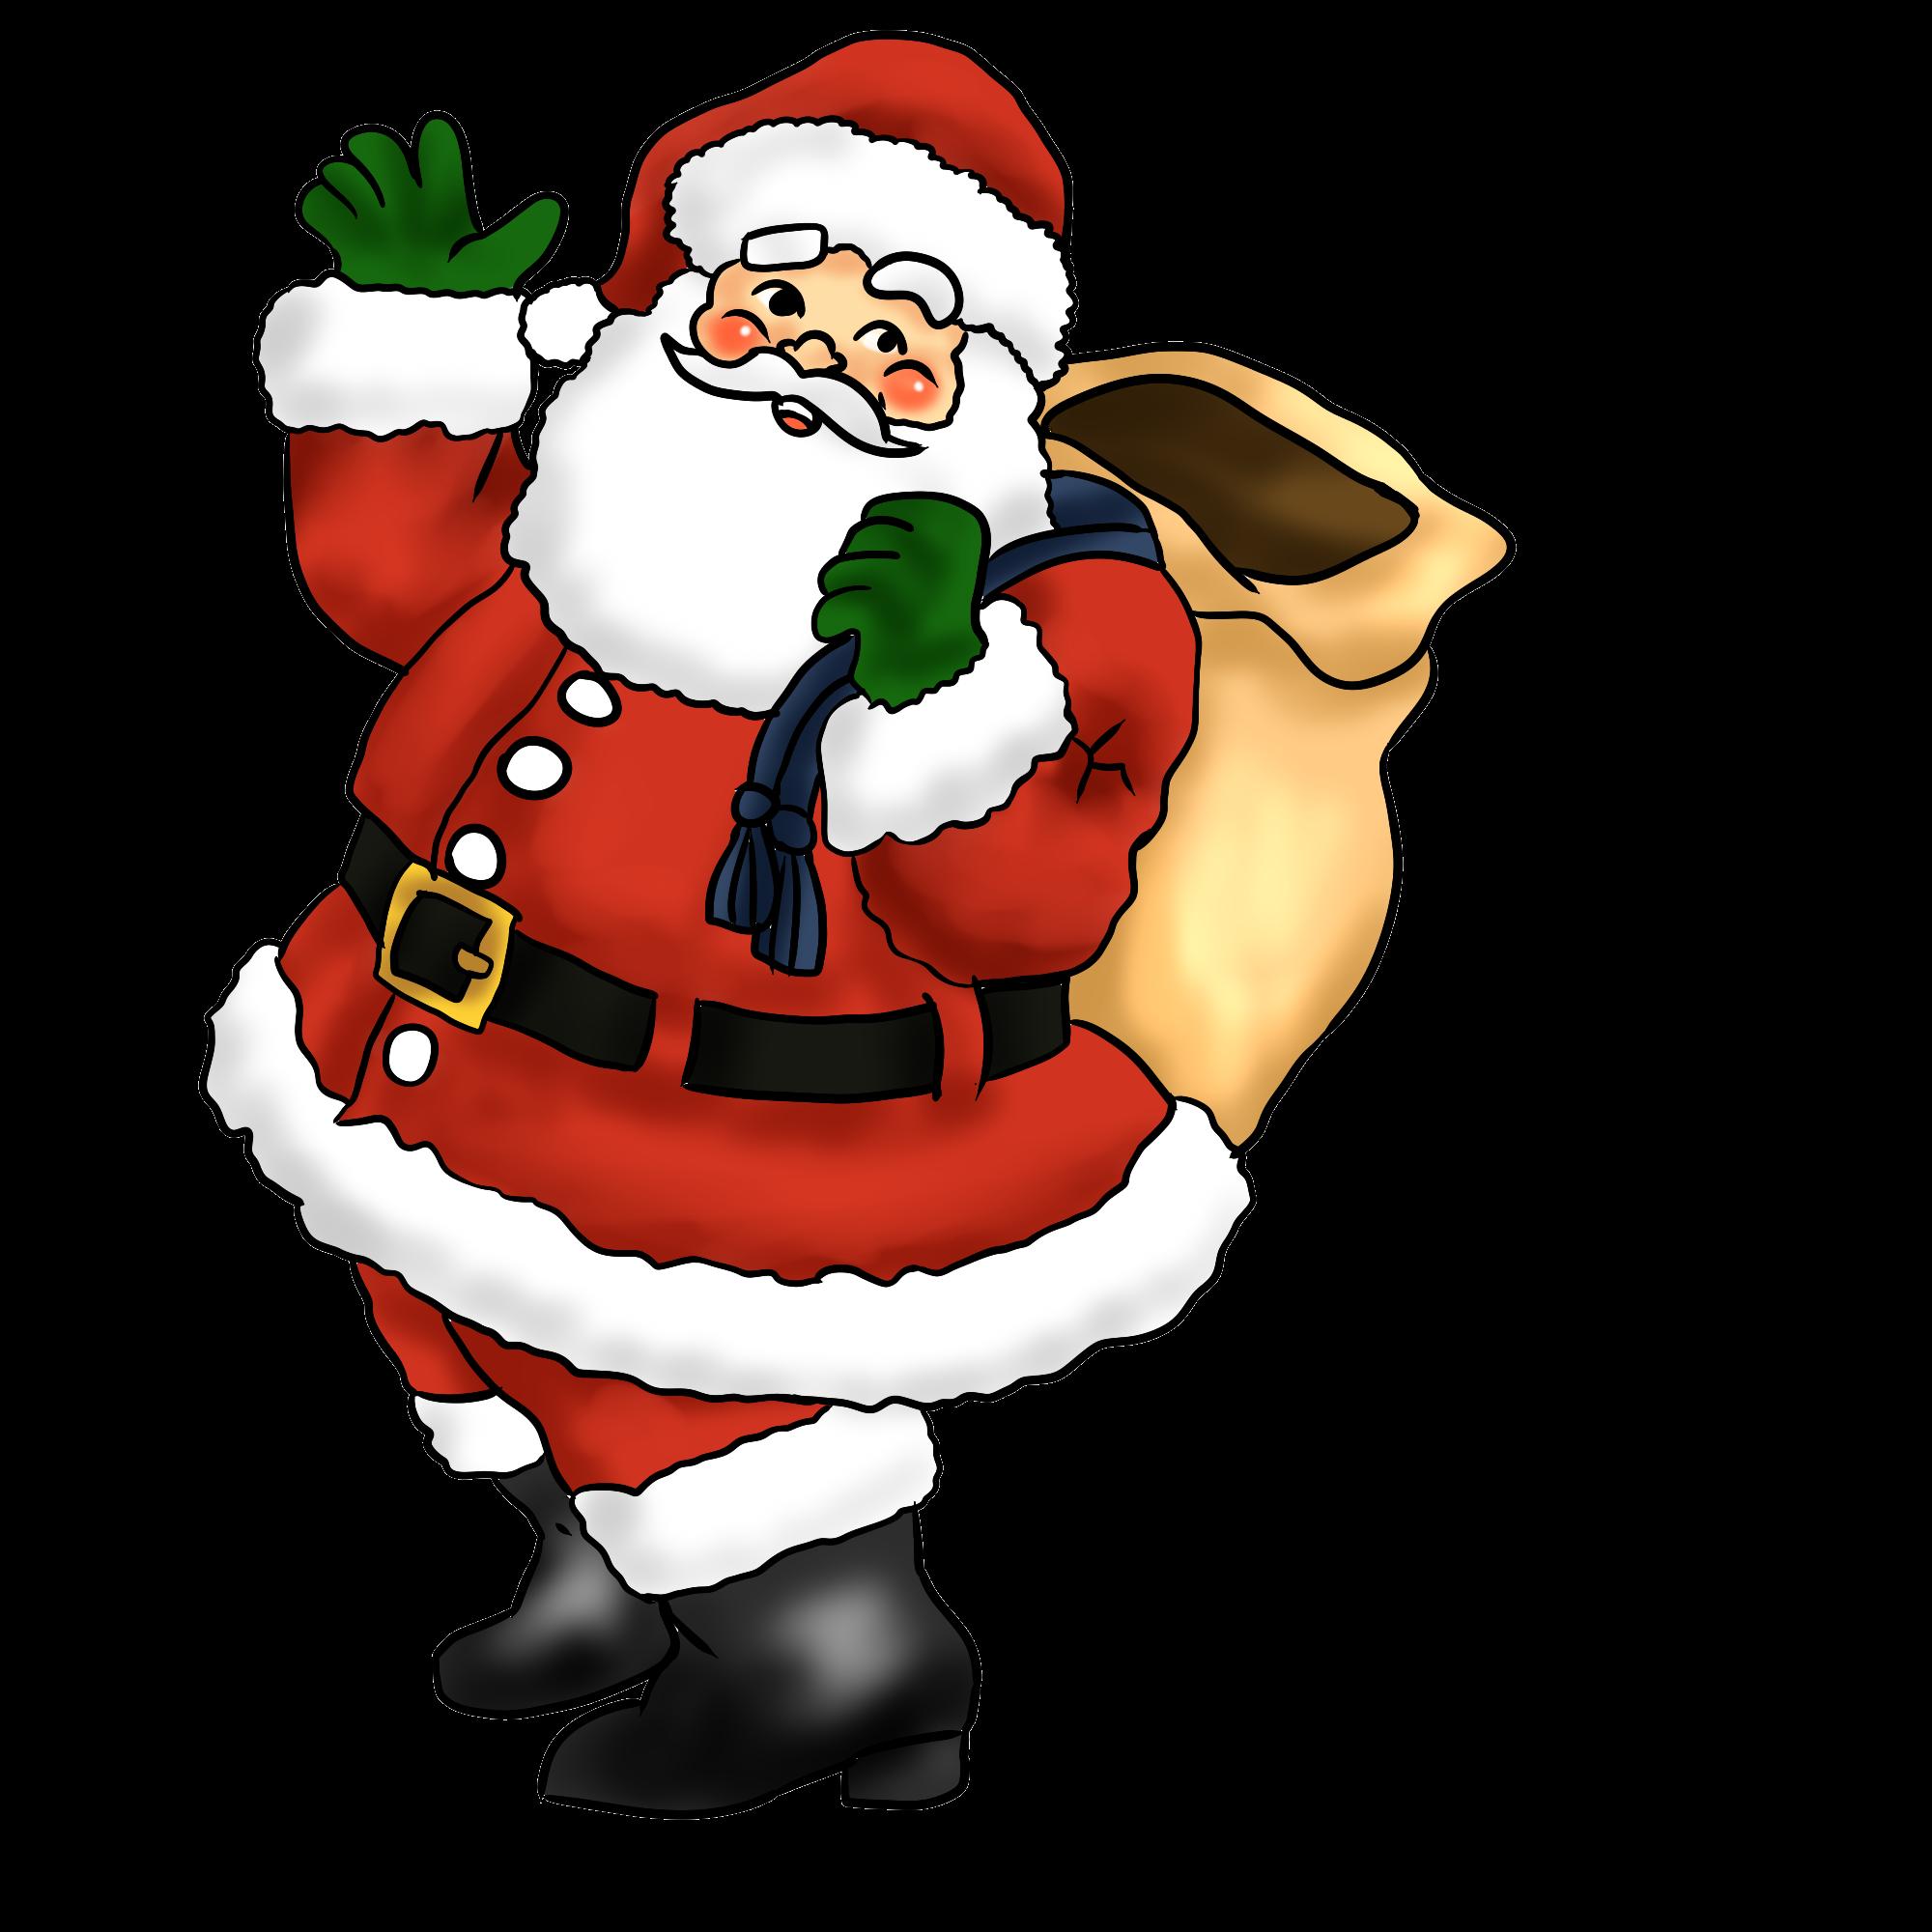 2000x2000 Claus Clipart Graphic Santa